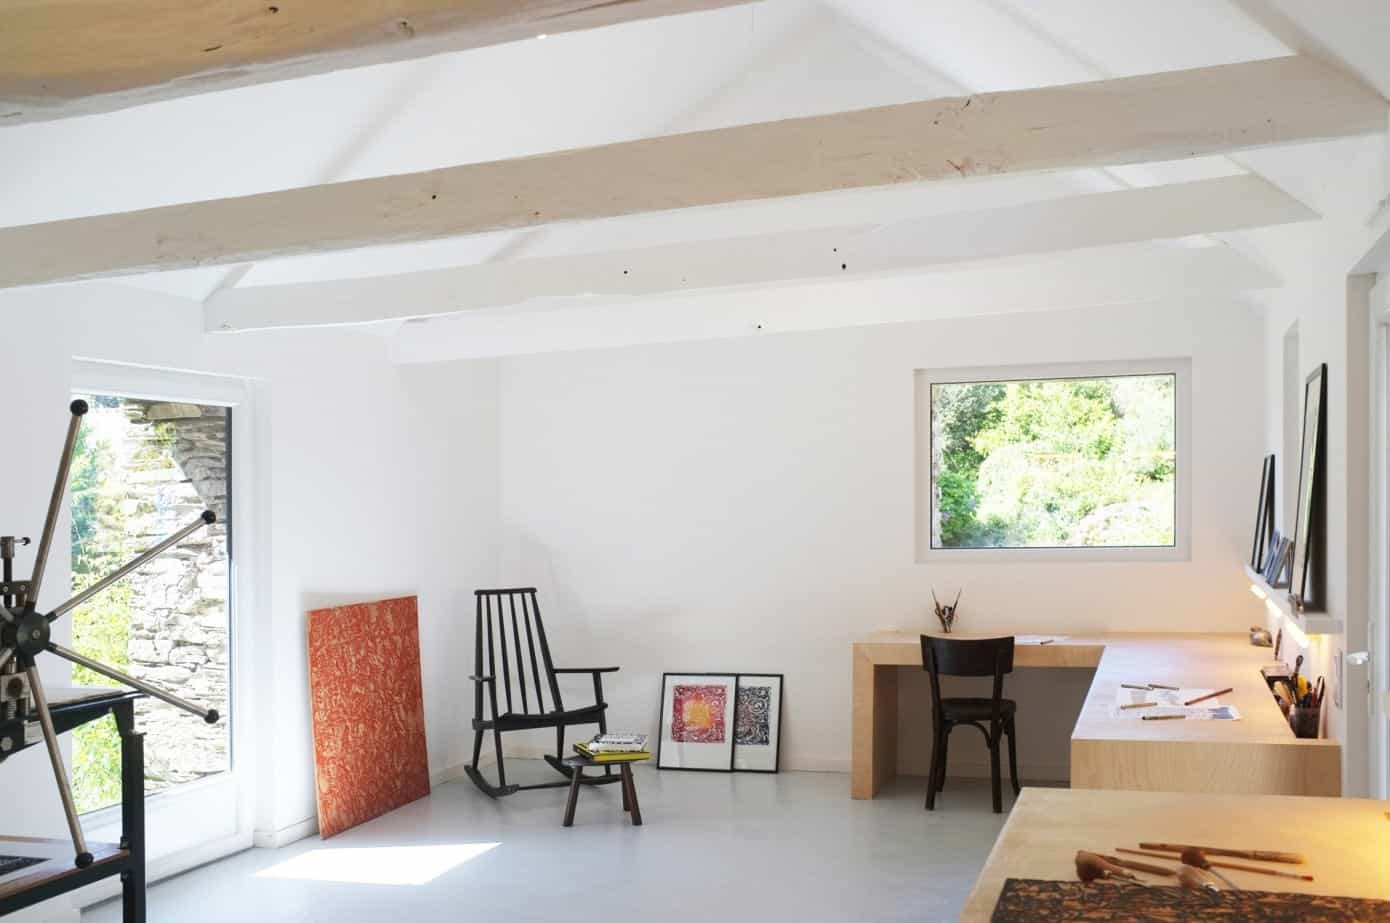 designrulz artist-studio-modal-architecture (16)